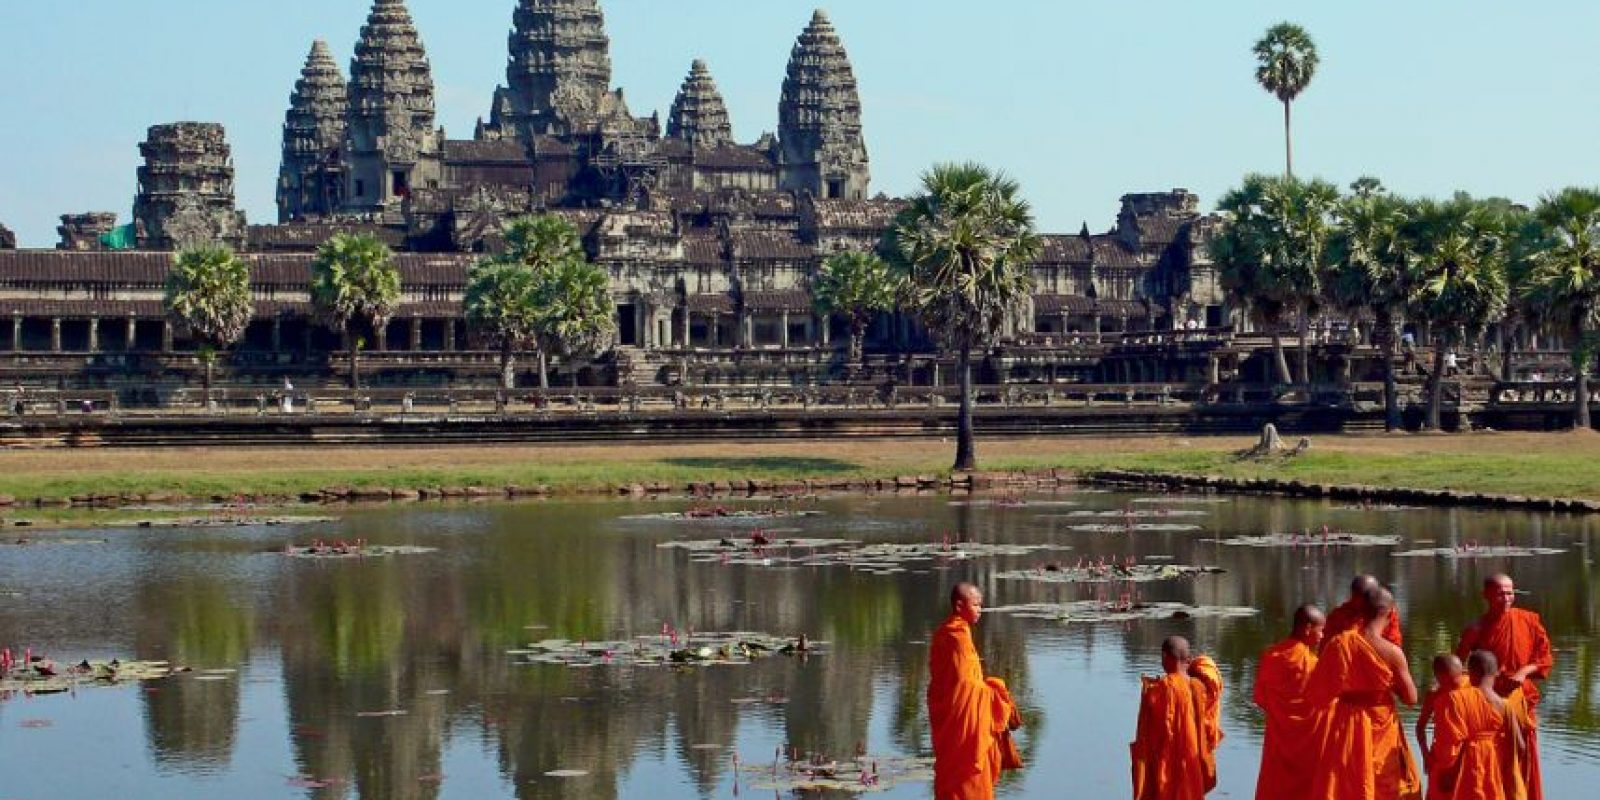 5. Siem Reap, Camboya, ganó esta posición gracias a lo 90.667 puntos que recibió. Foto:Vía Wiki